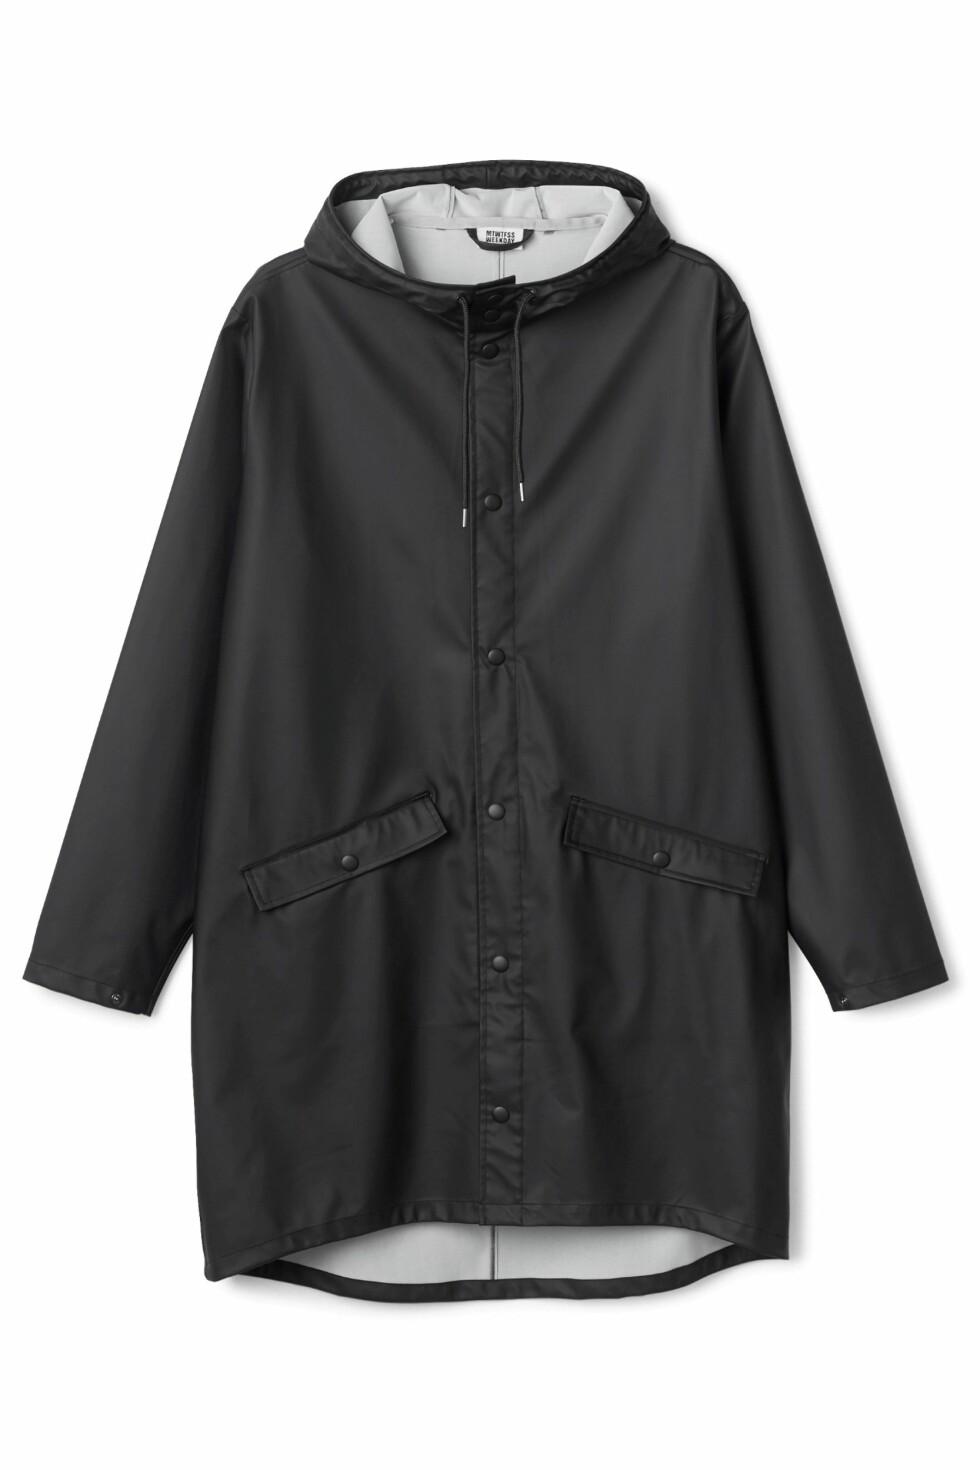 Regnjakke fra Weekday | kr 420 | http://shop.weekday.com/se/Womens_shop/Black_Friday/Sune_Raincoat/12059839-6779518.1#c-49930